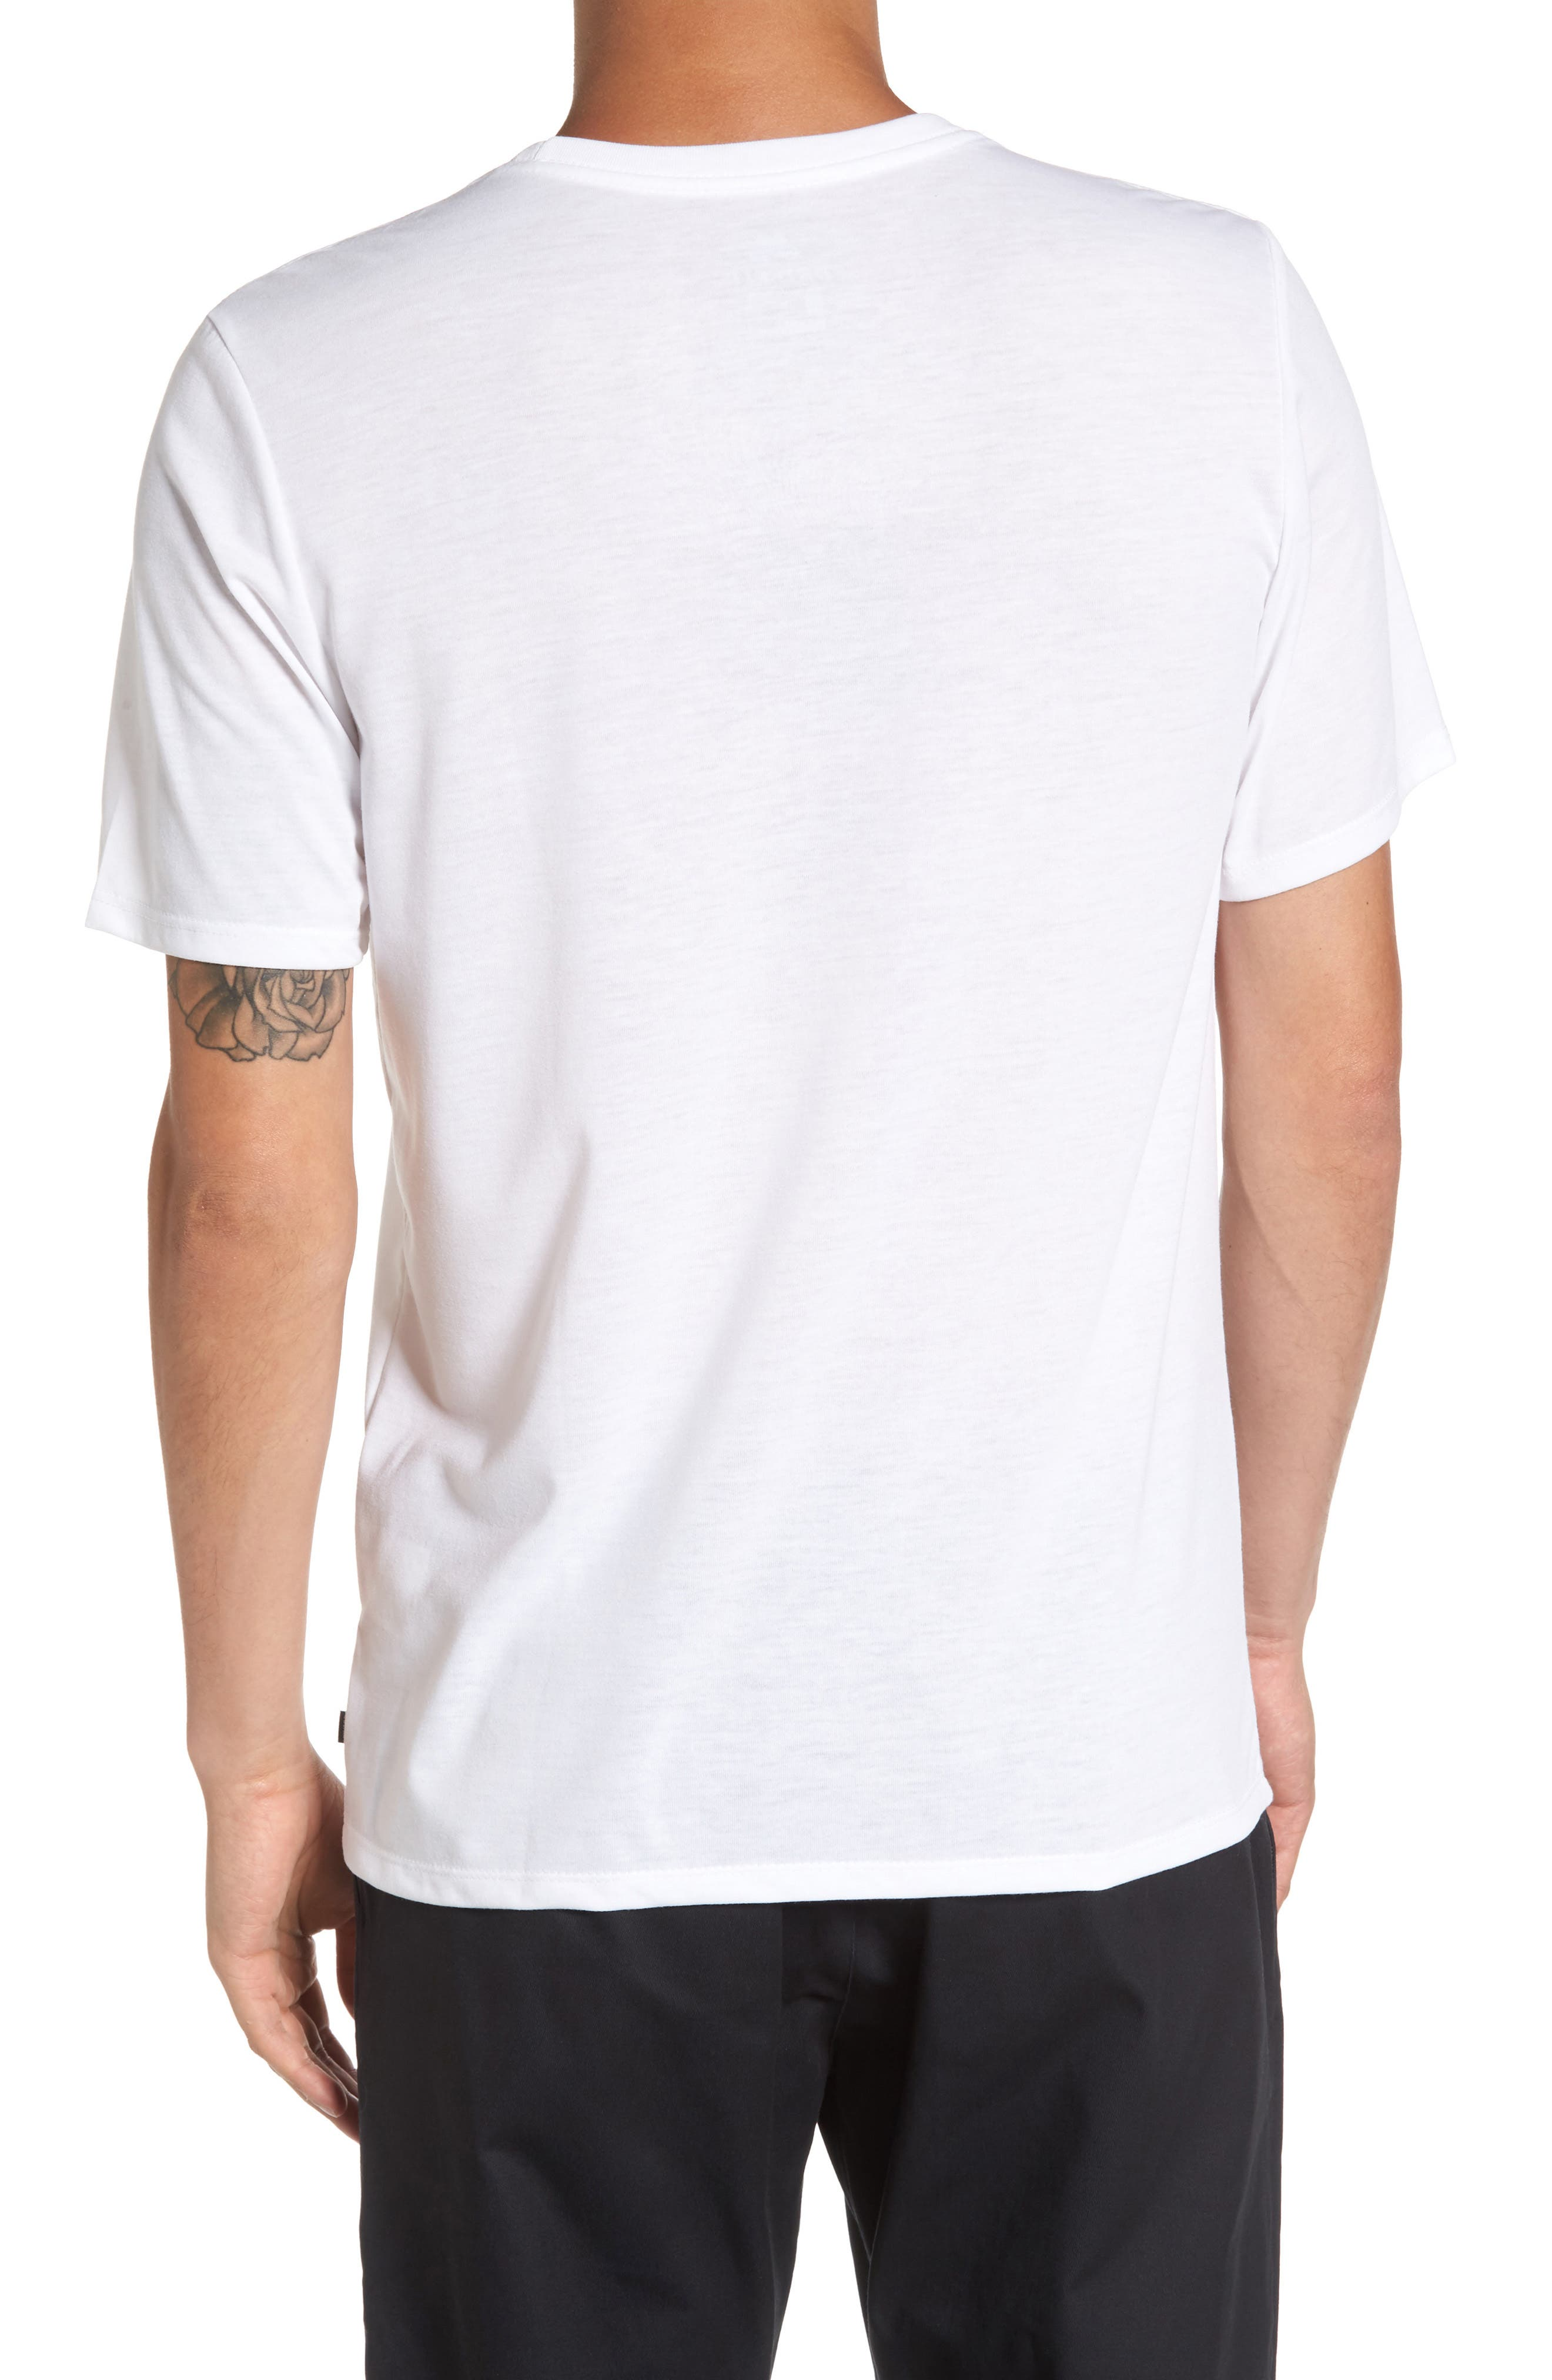 NIKE SB,                             Dry Rooster T-Shirt,                             Alternate thumbnail 2, color,                             100